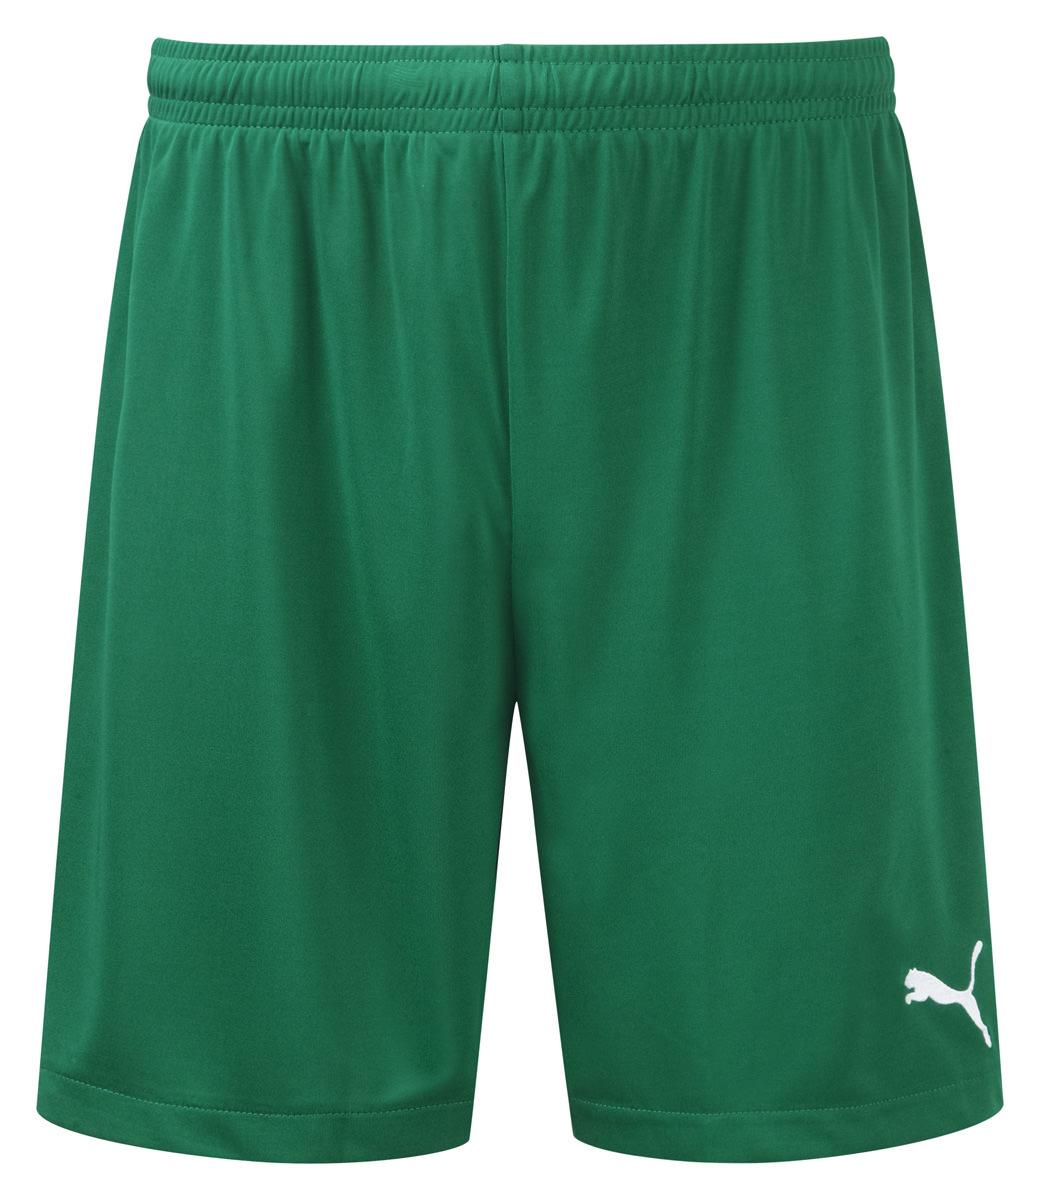 Puma SMU Velize Shorts - Green